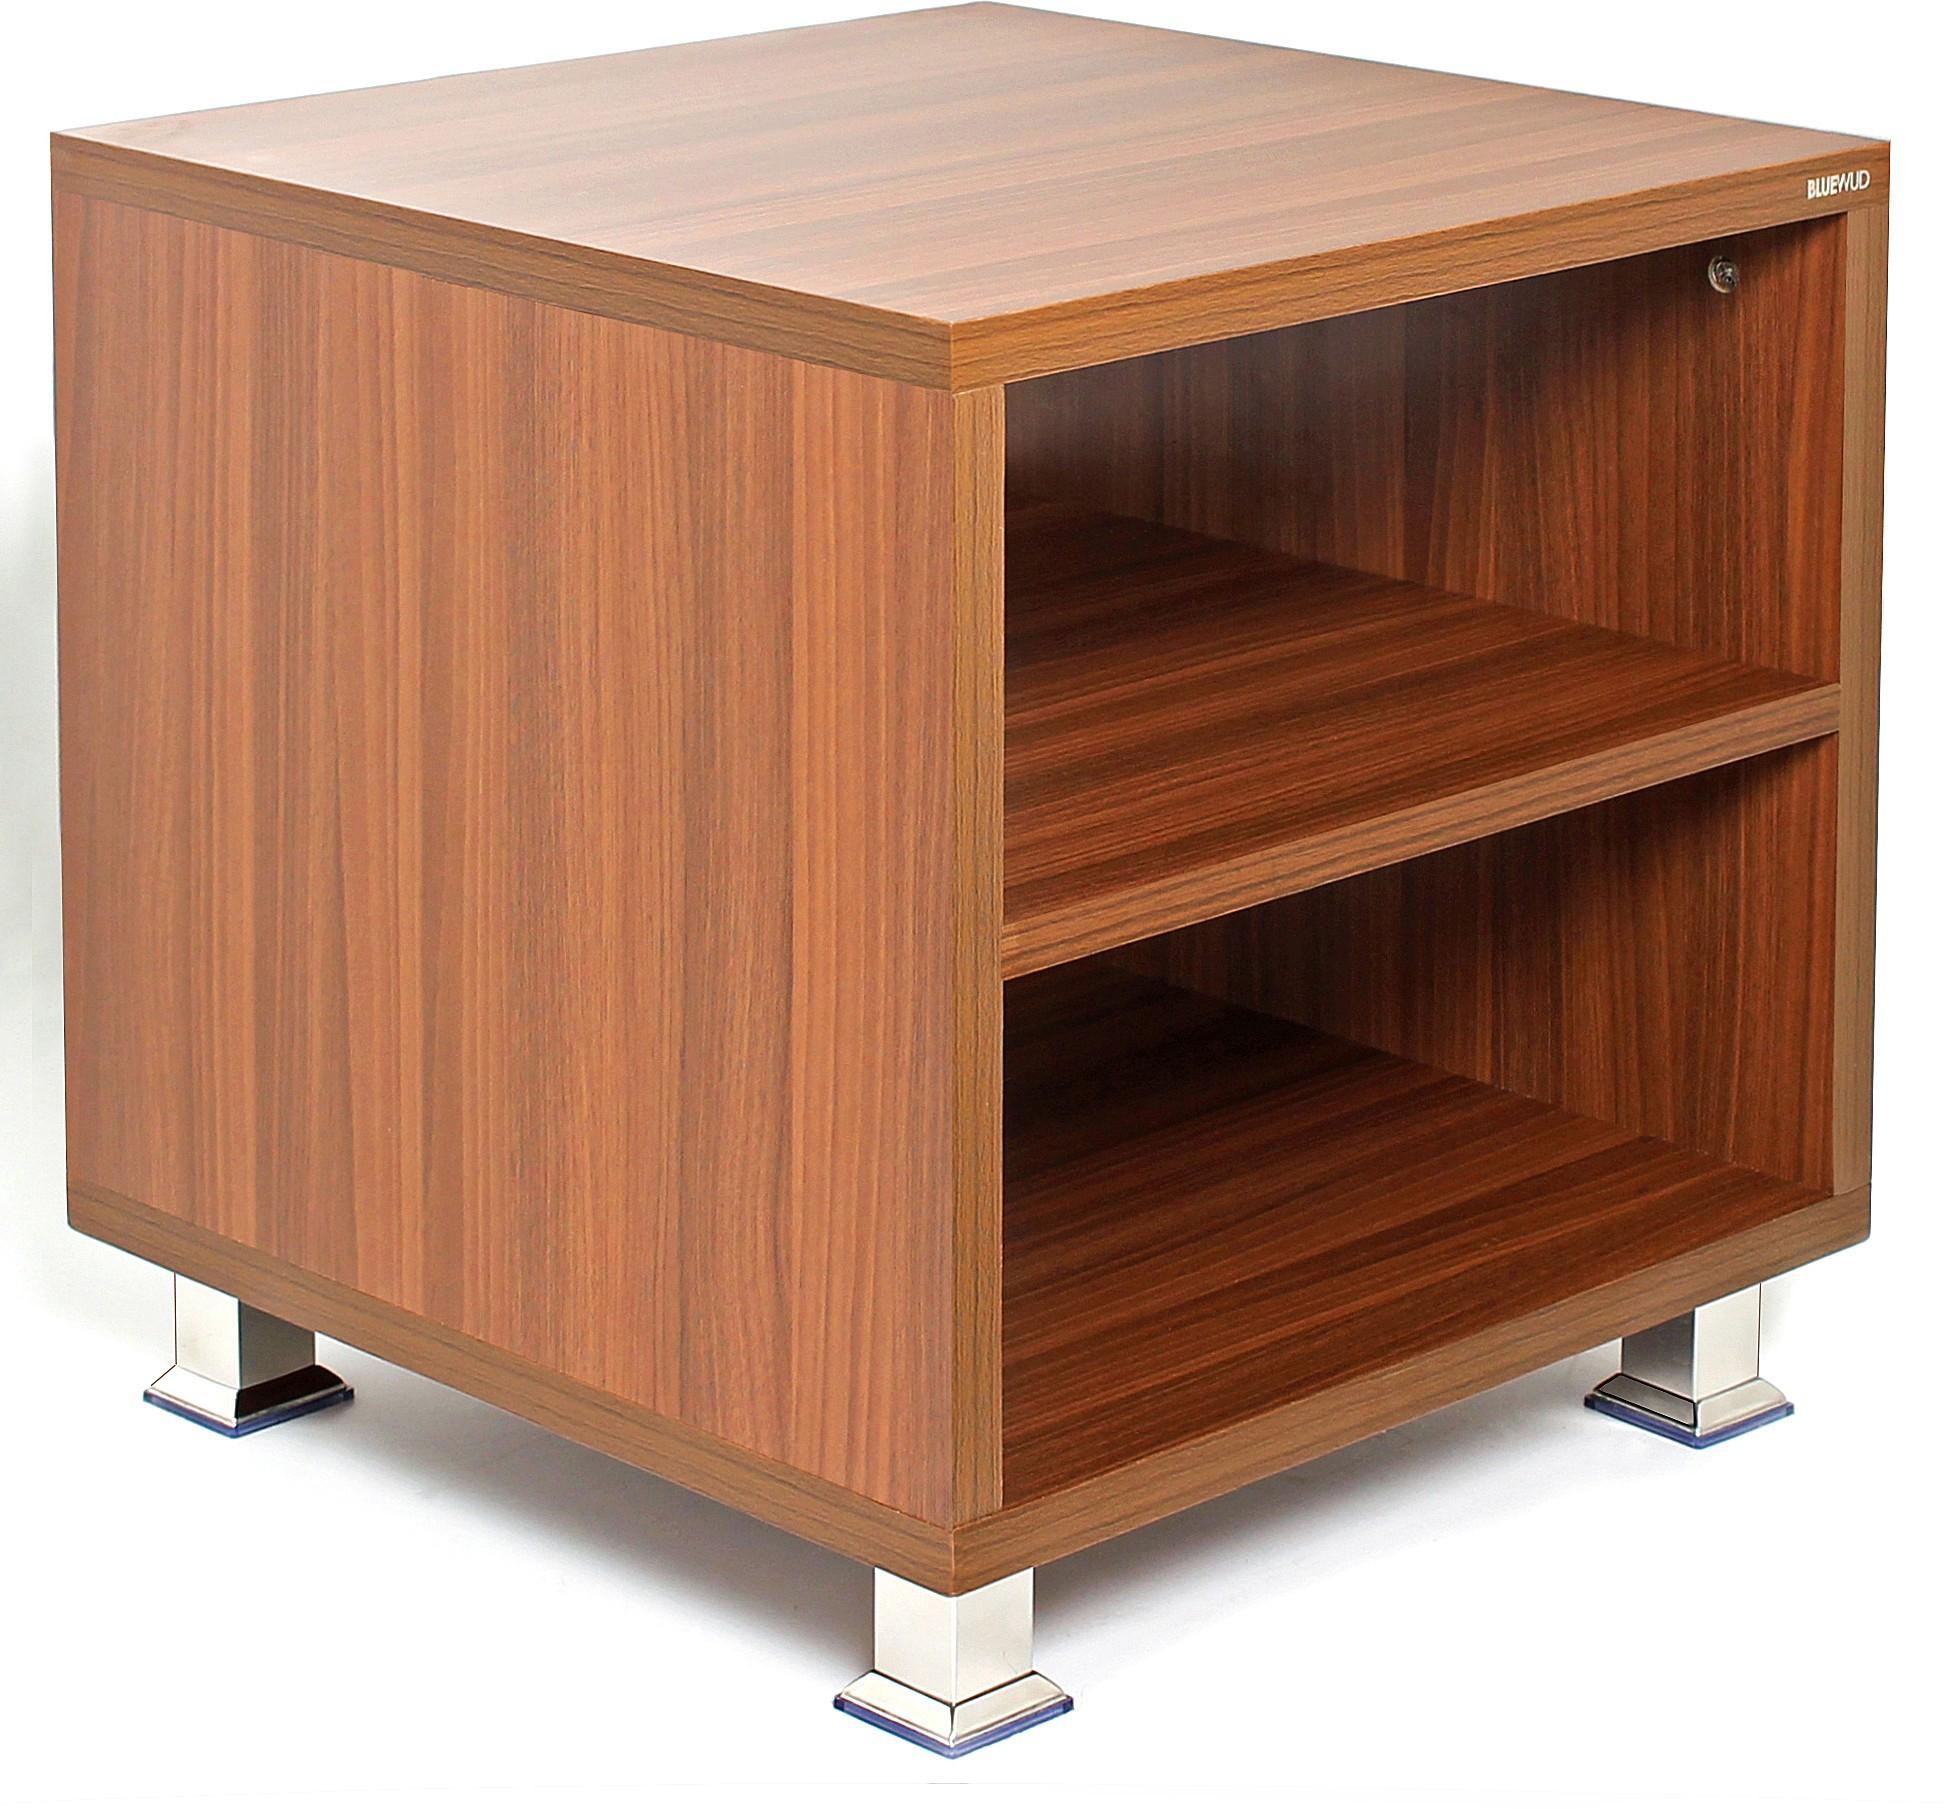 View Bluewud Leo Engineered Wood Side Table(Finish Color - Walnut) Furniture (Bluewud)